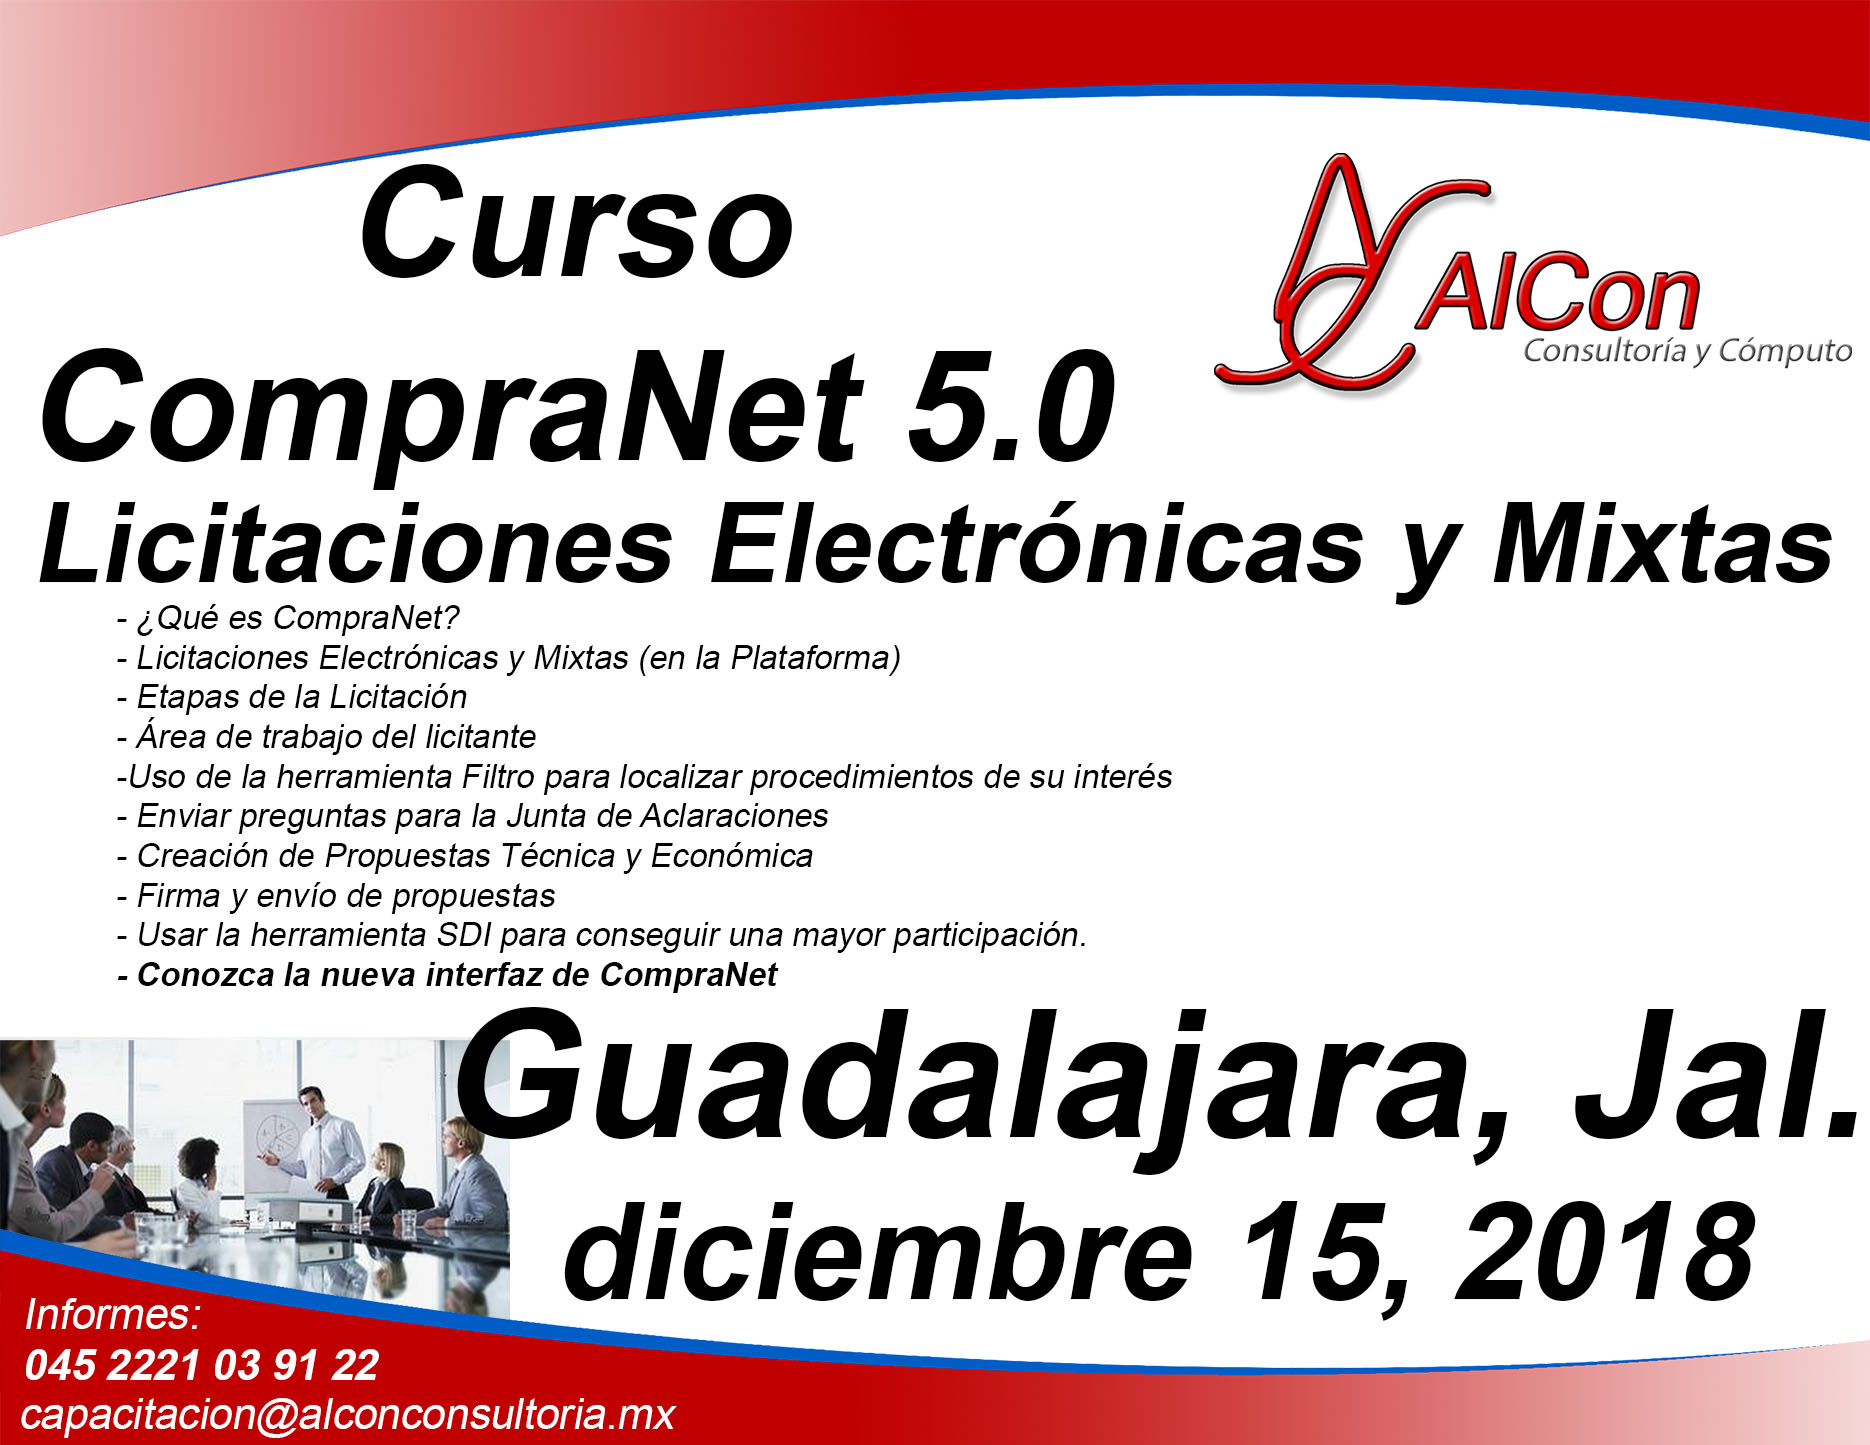 Curso CompraNet 5.0 para licitantes  Guadalajara, Jal.